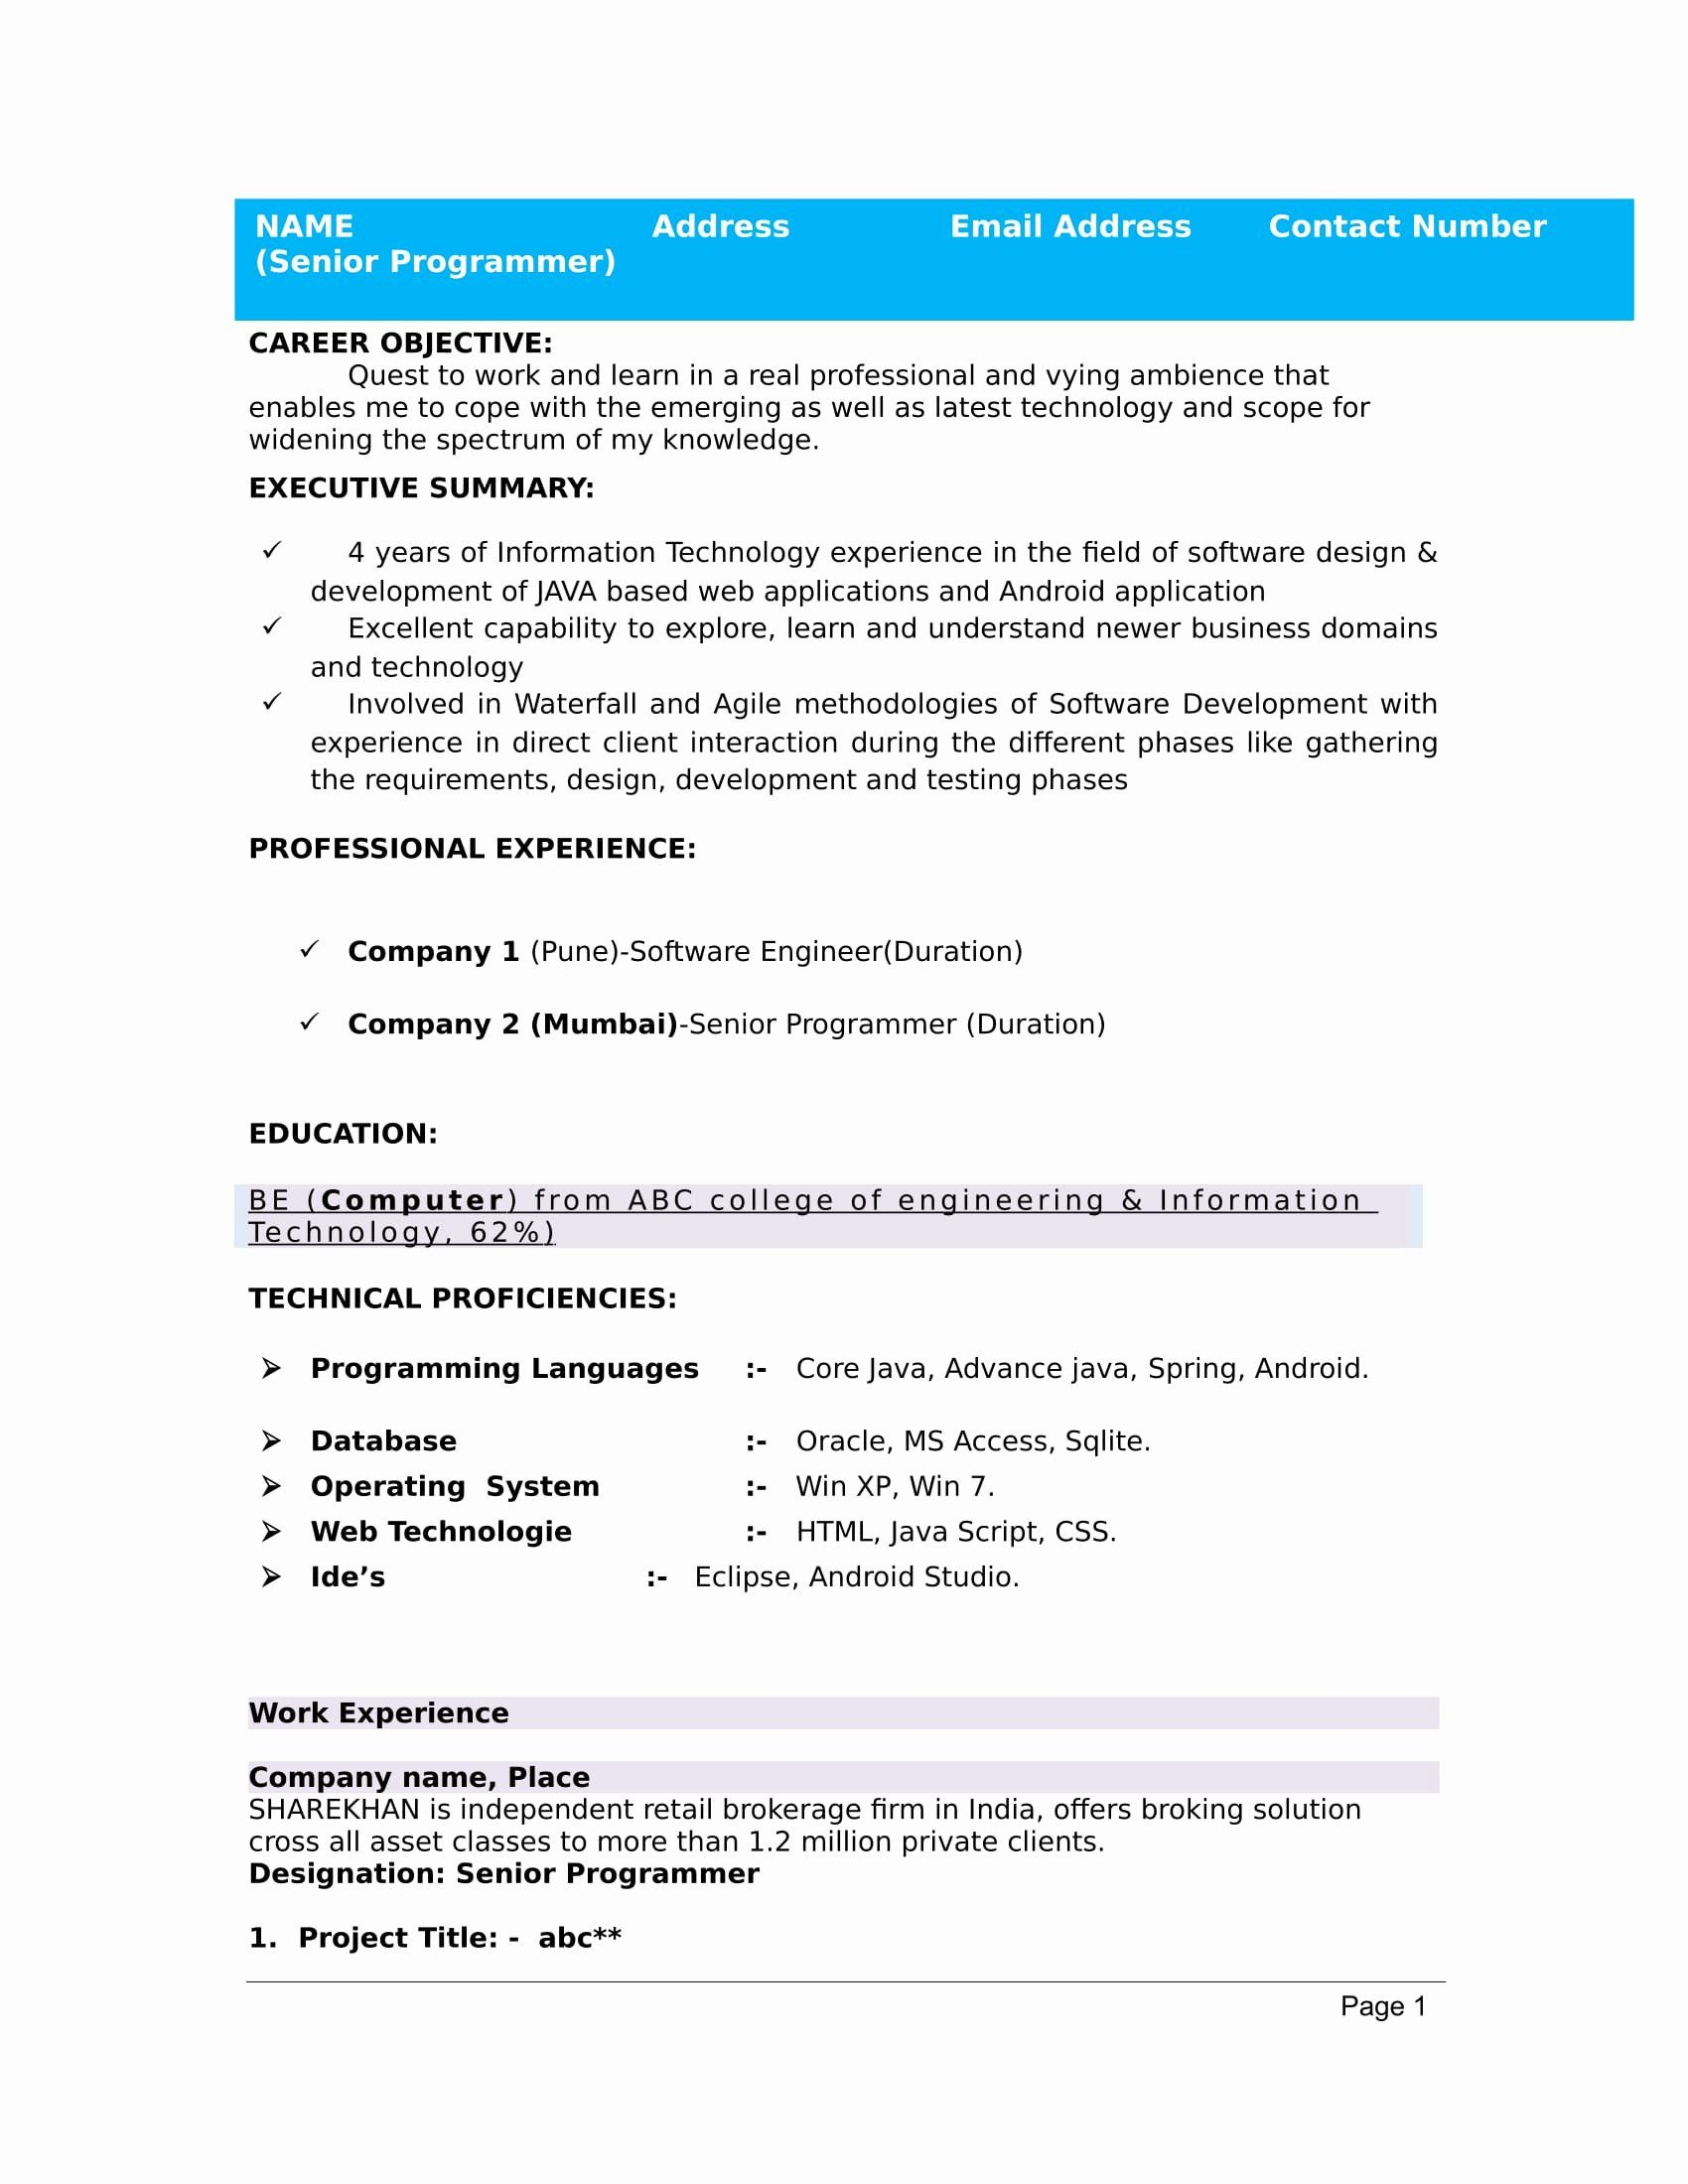 Resume Samples Pdf India